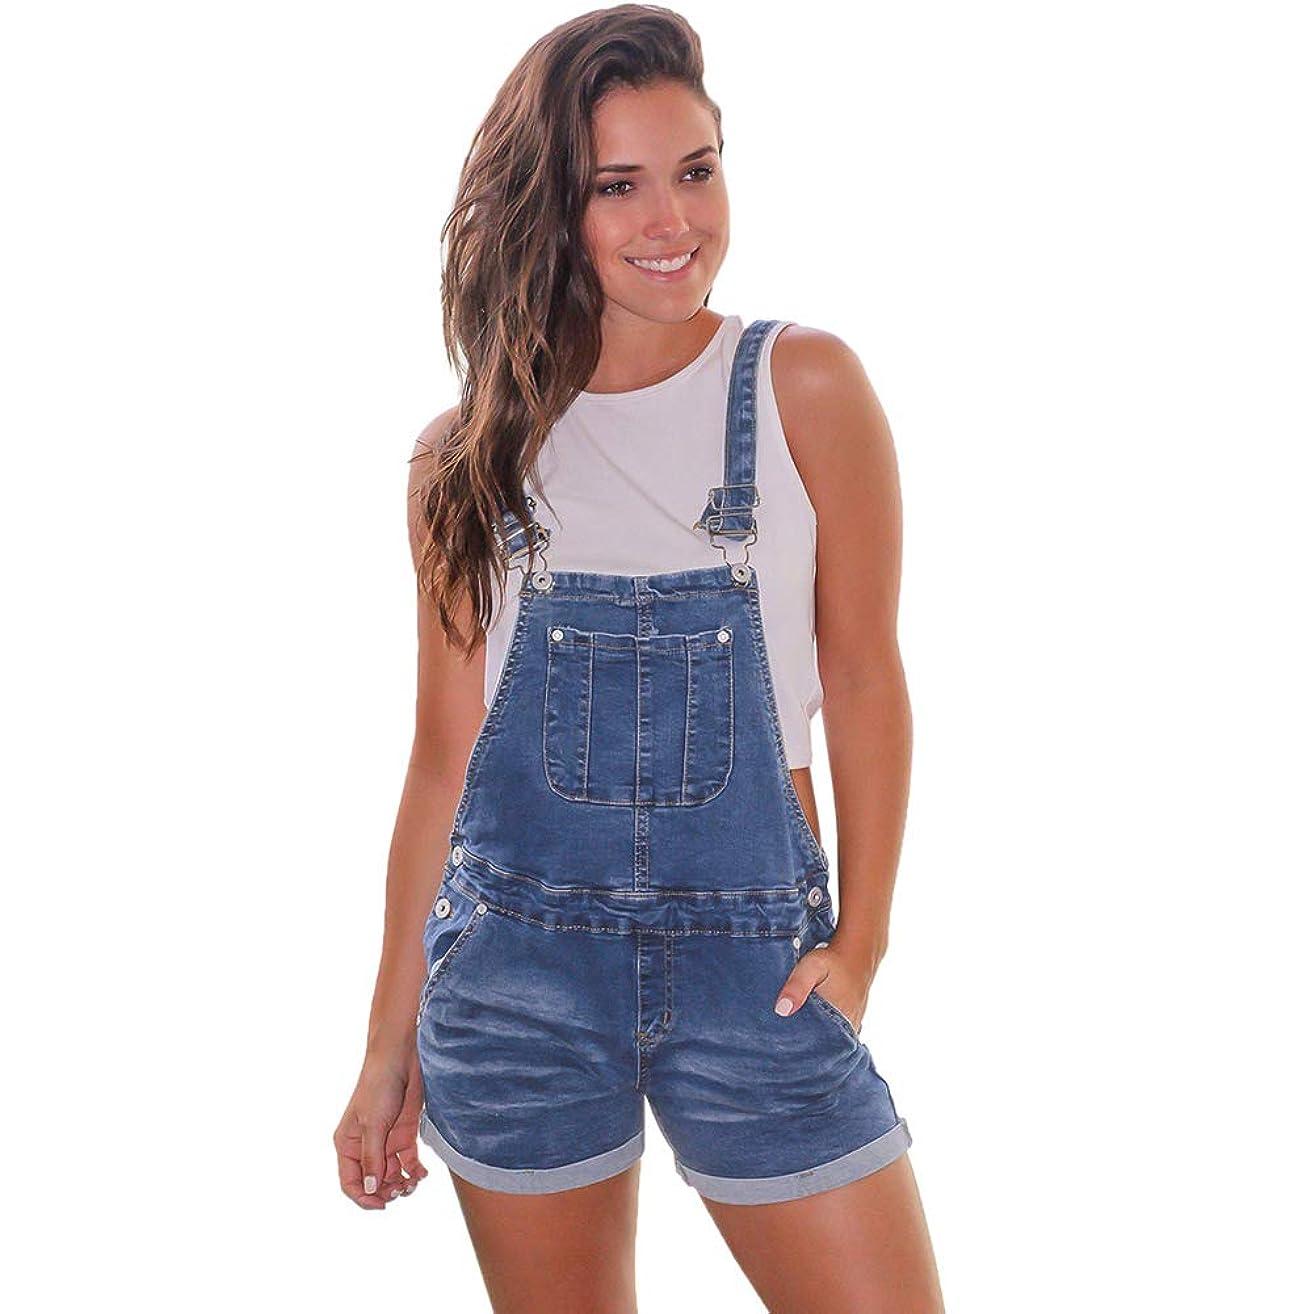 Scioltoo Girl Cute Denim bib Overall Pants Classic Work Stretch Shorts